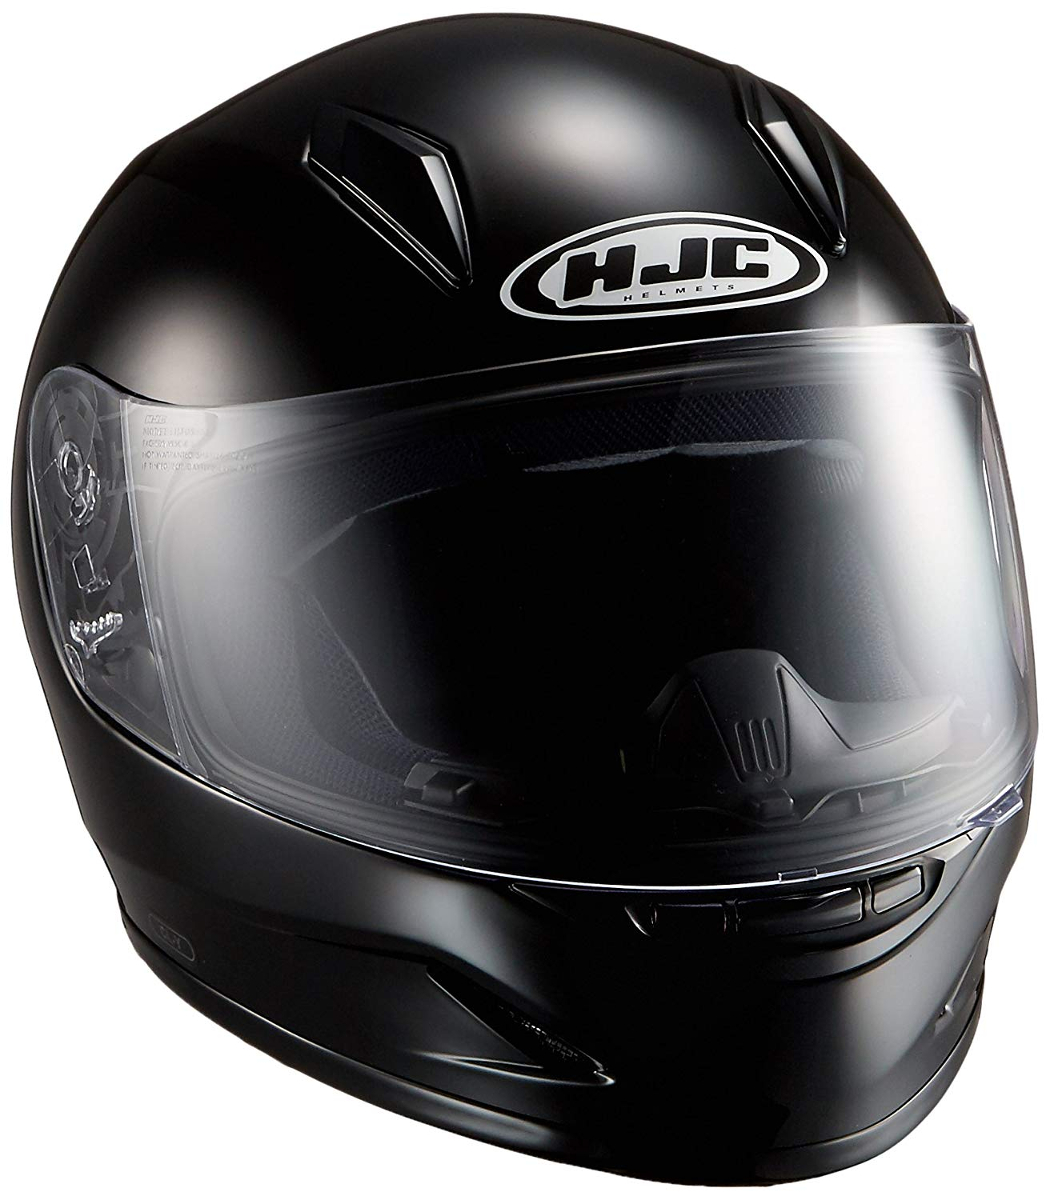 RSタイチ (RS TAICHI) バイク用 ヘルメット フルフェイス HJC CL-Y ソリッド BLACK L HJH0579900L